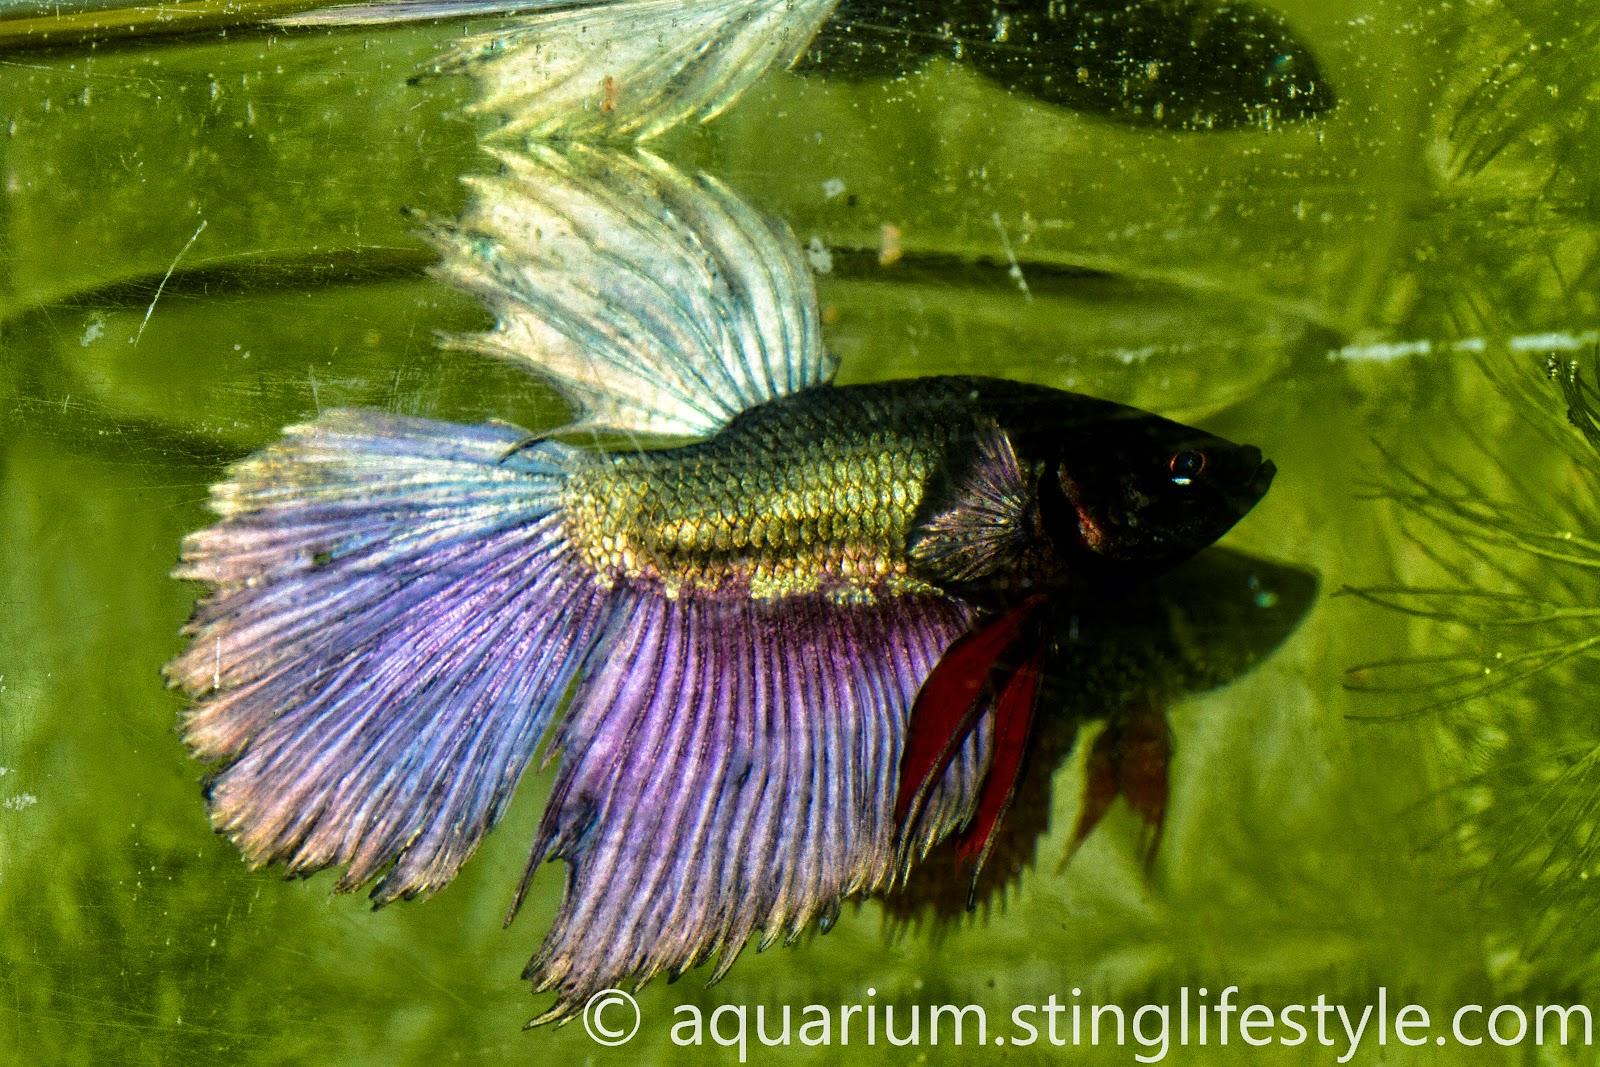 Siamese fighting fish aquarium info for Betta fish information